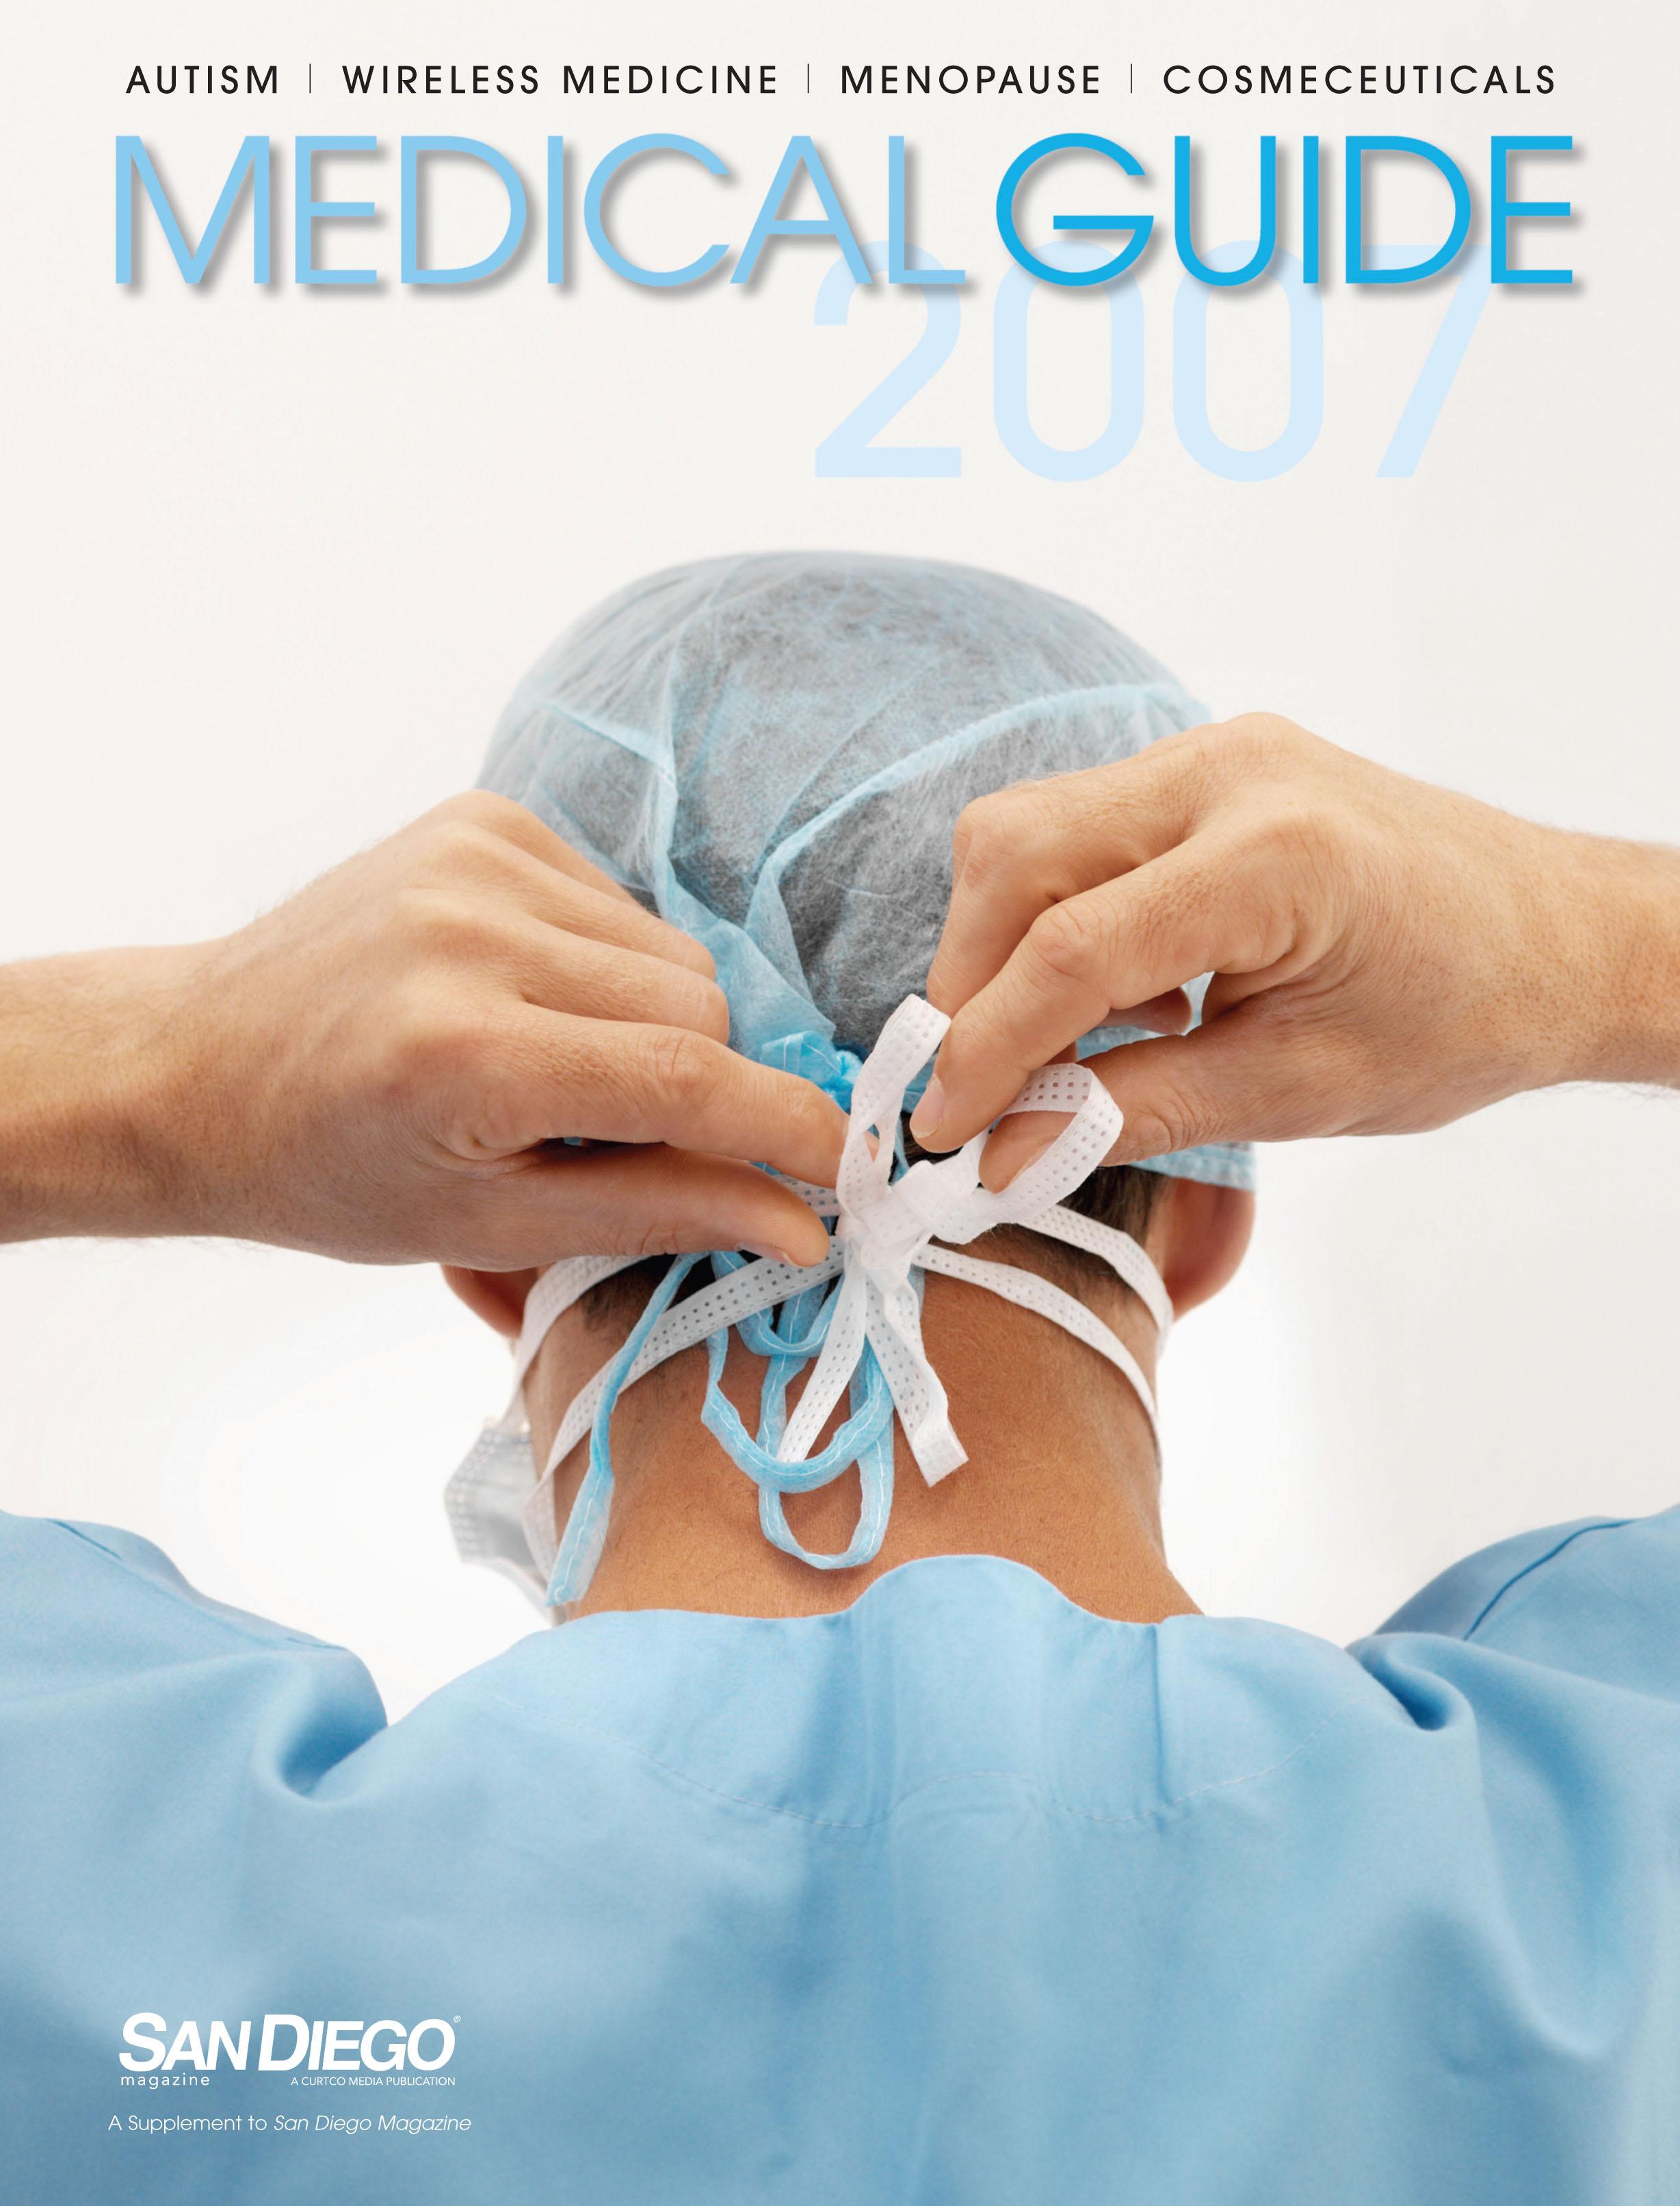 MG 2007 Cover.jpg